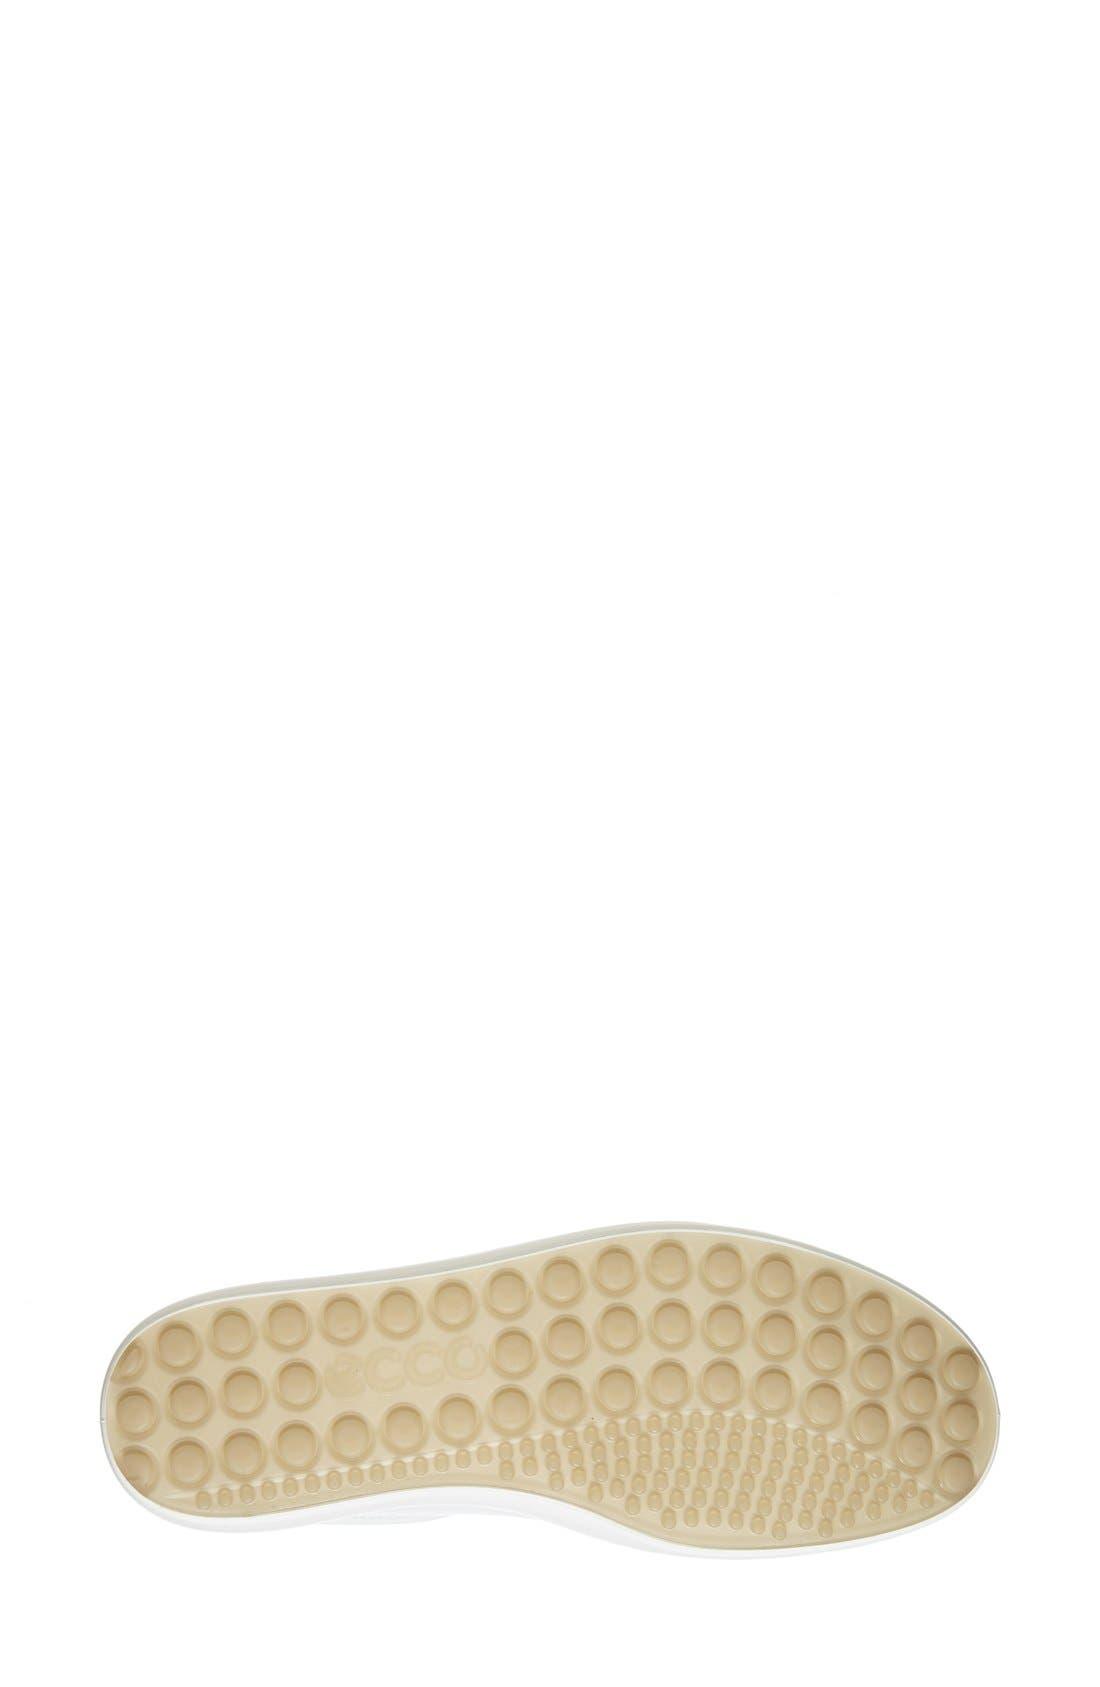 'Soft 7' High Top Sneaker,                             Alternate thumbnail 4, color,                             WHITE